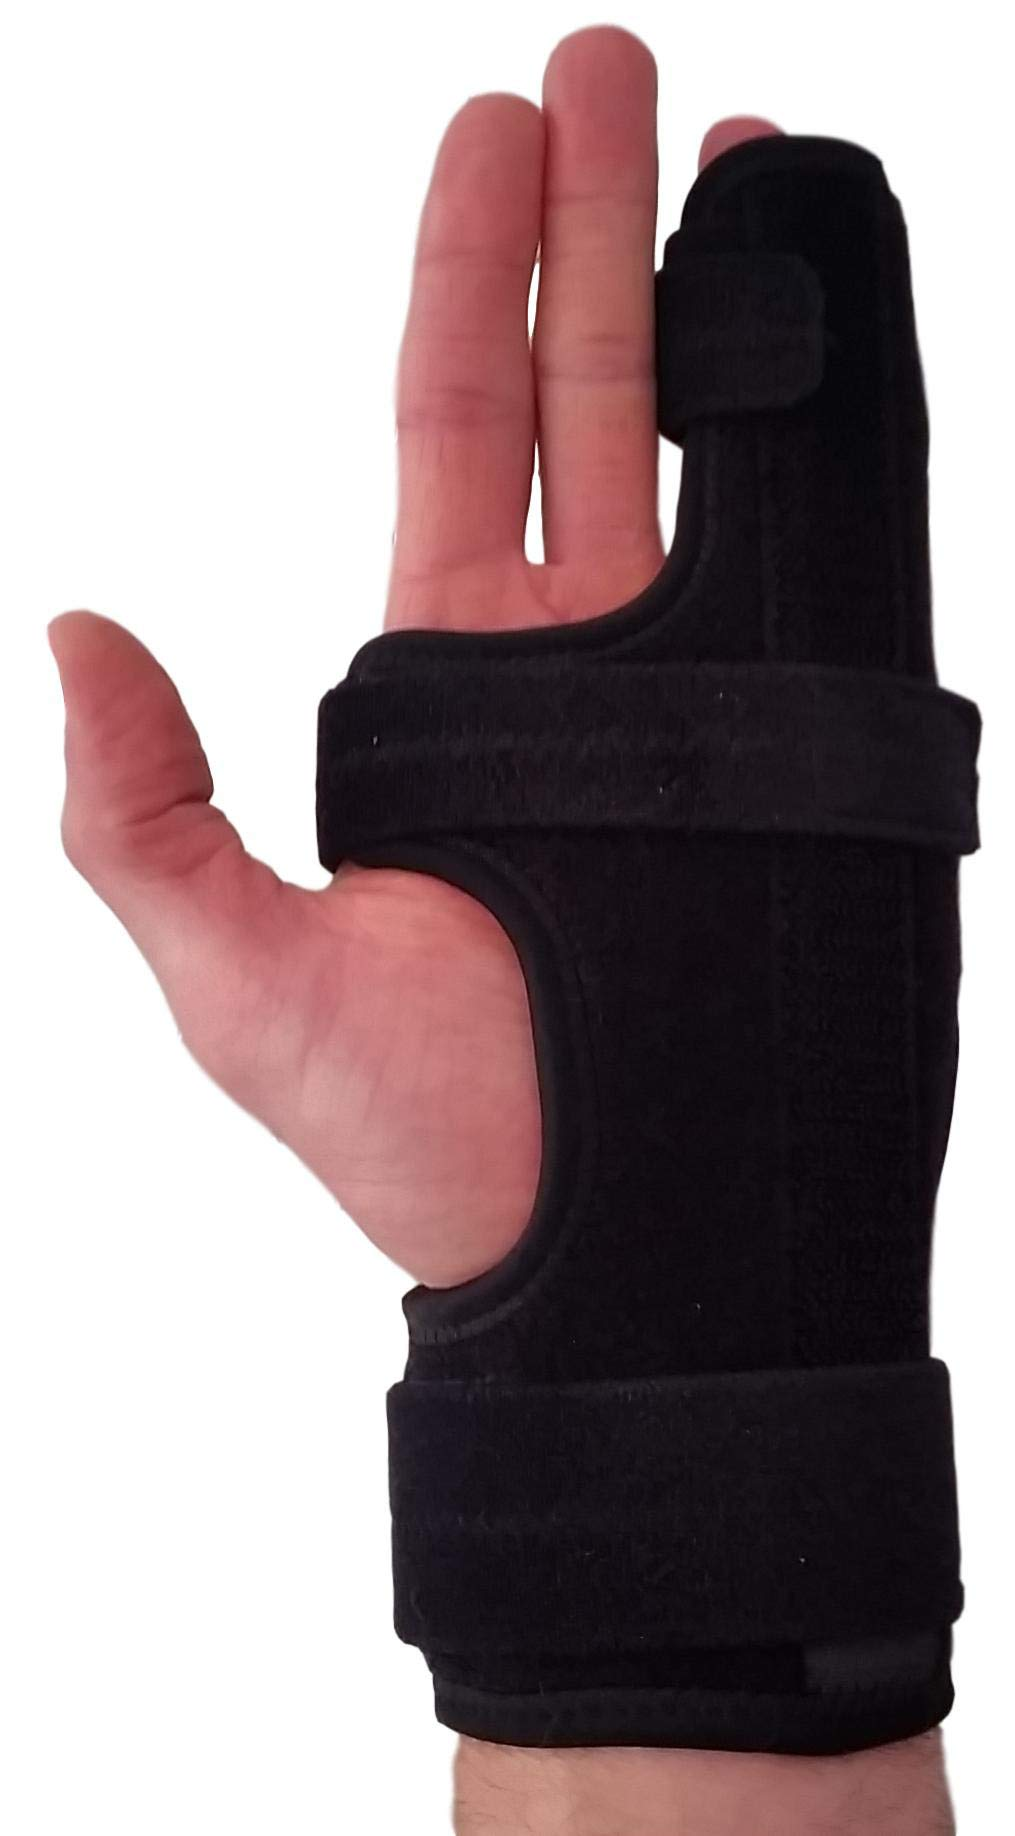 Metacarpal Finger Splint Hand Brace - Hand Brace & Metacarpal Support for Broken Fingers, Wrist & Hand Injuries or Little Finger Fracture (Left - Small/Med) by ARMSTRONG AMERIKA